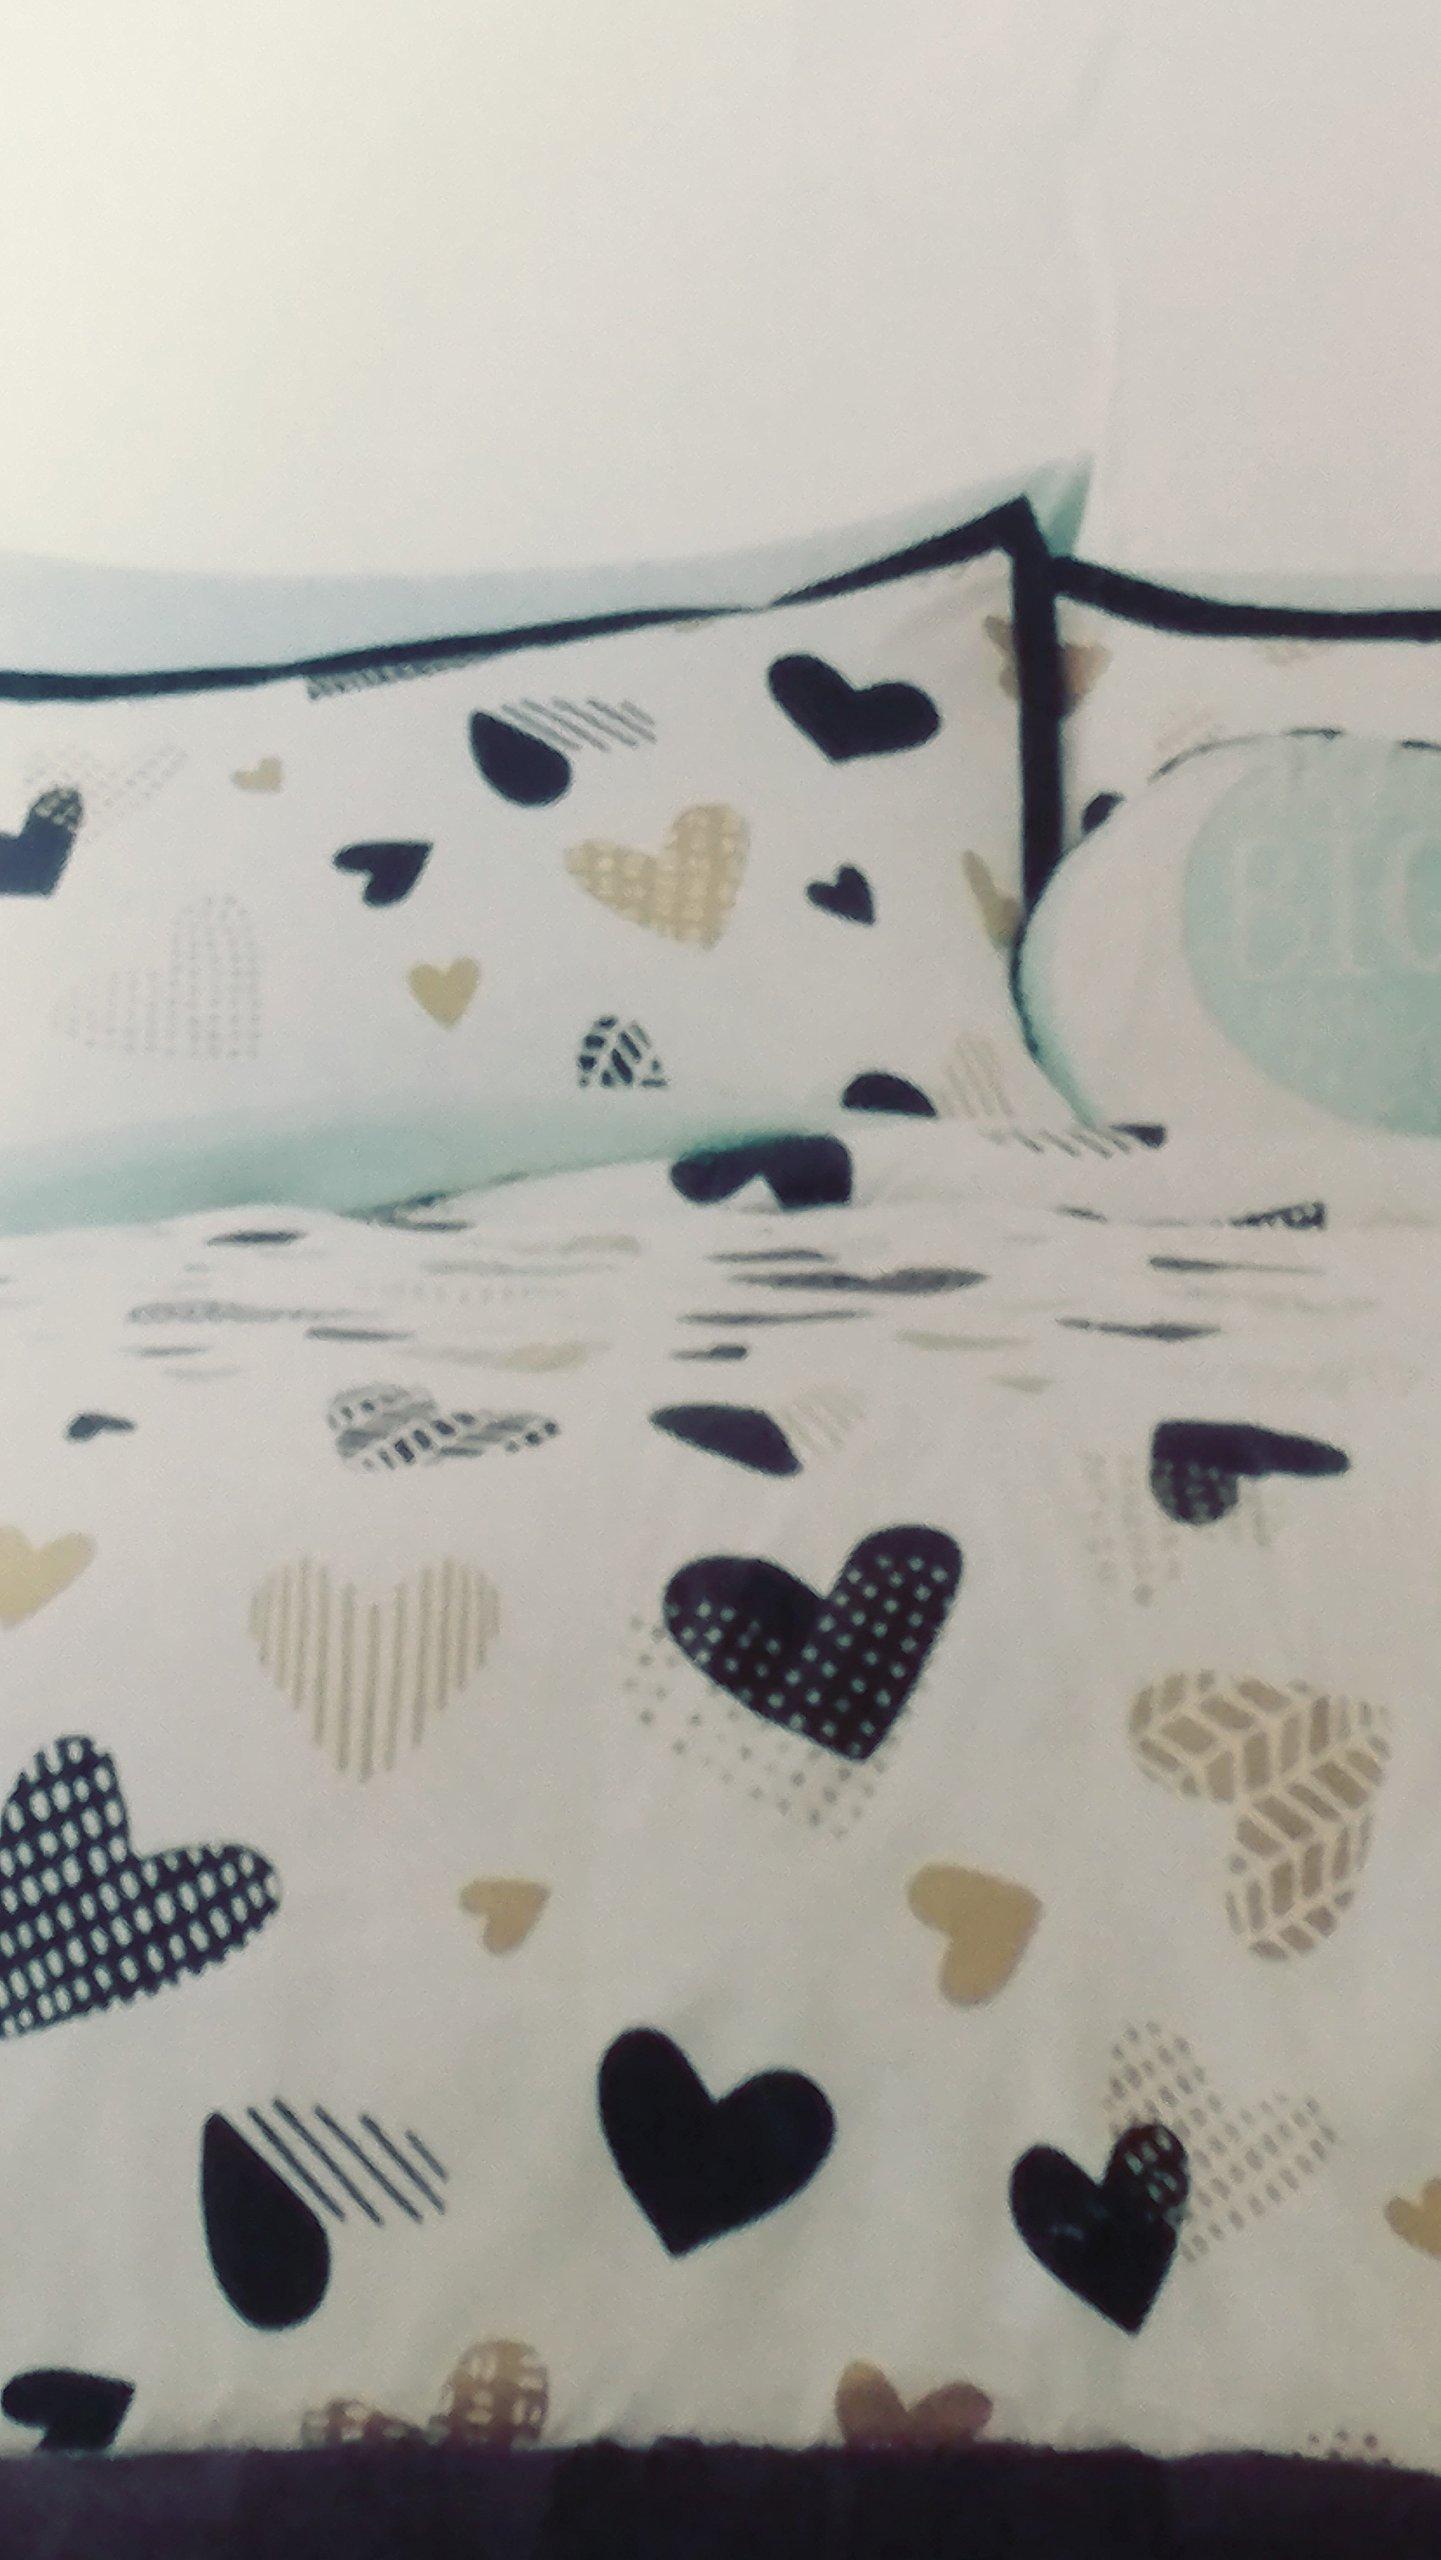 Pillowfort-Hello-Hearts-Comforter-Set-BlackWhite-3PC-FullQueen